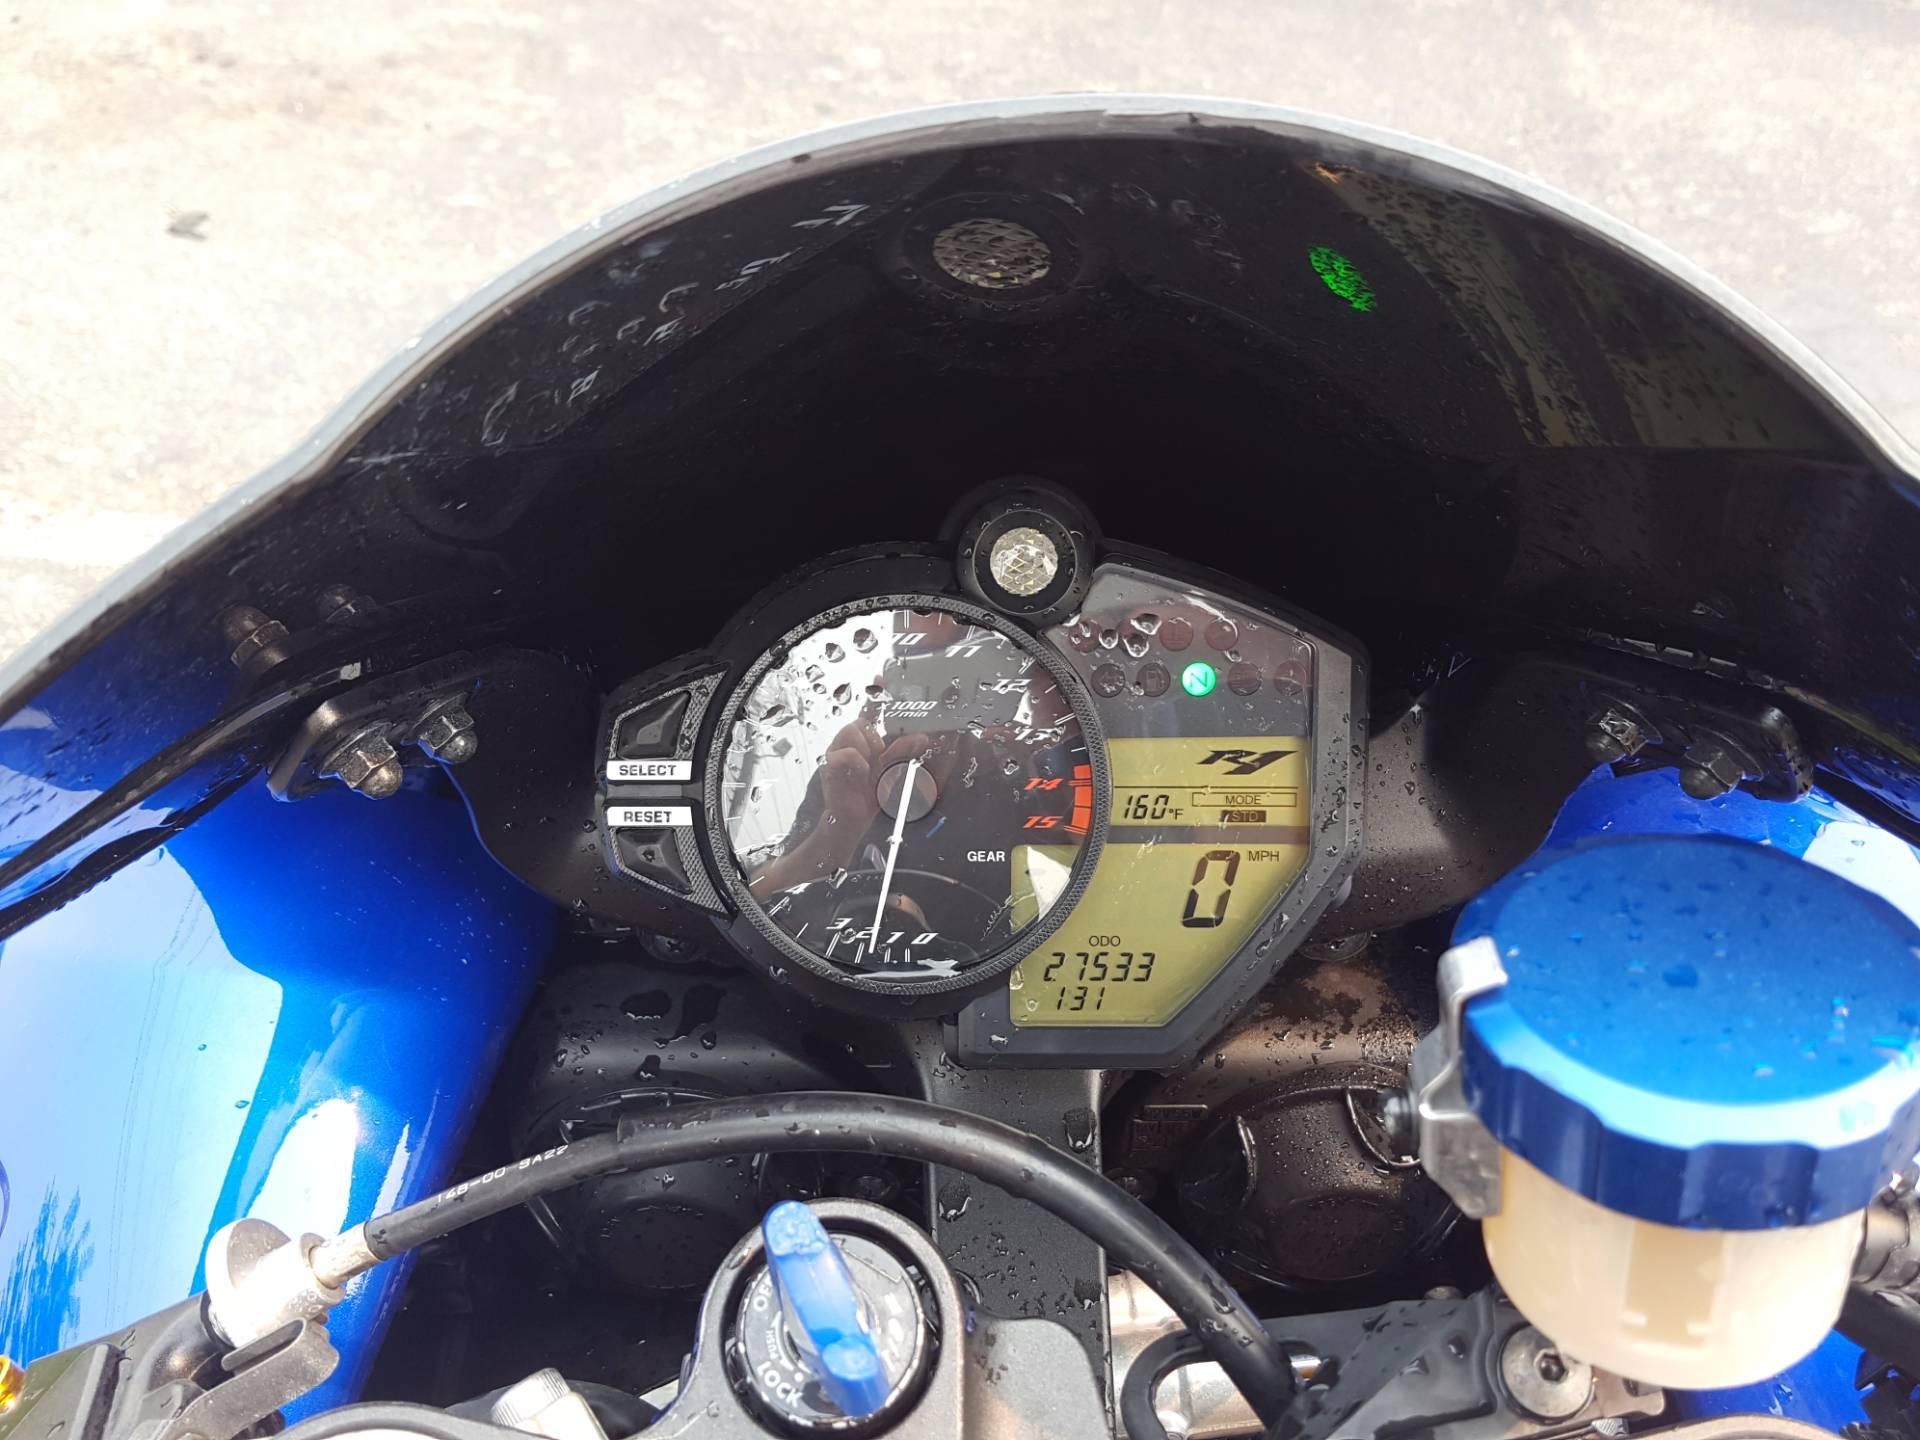 2009 Yamaha YZFR1 5